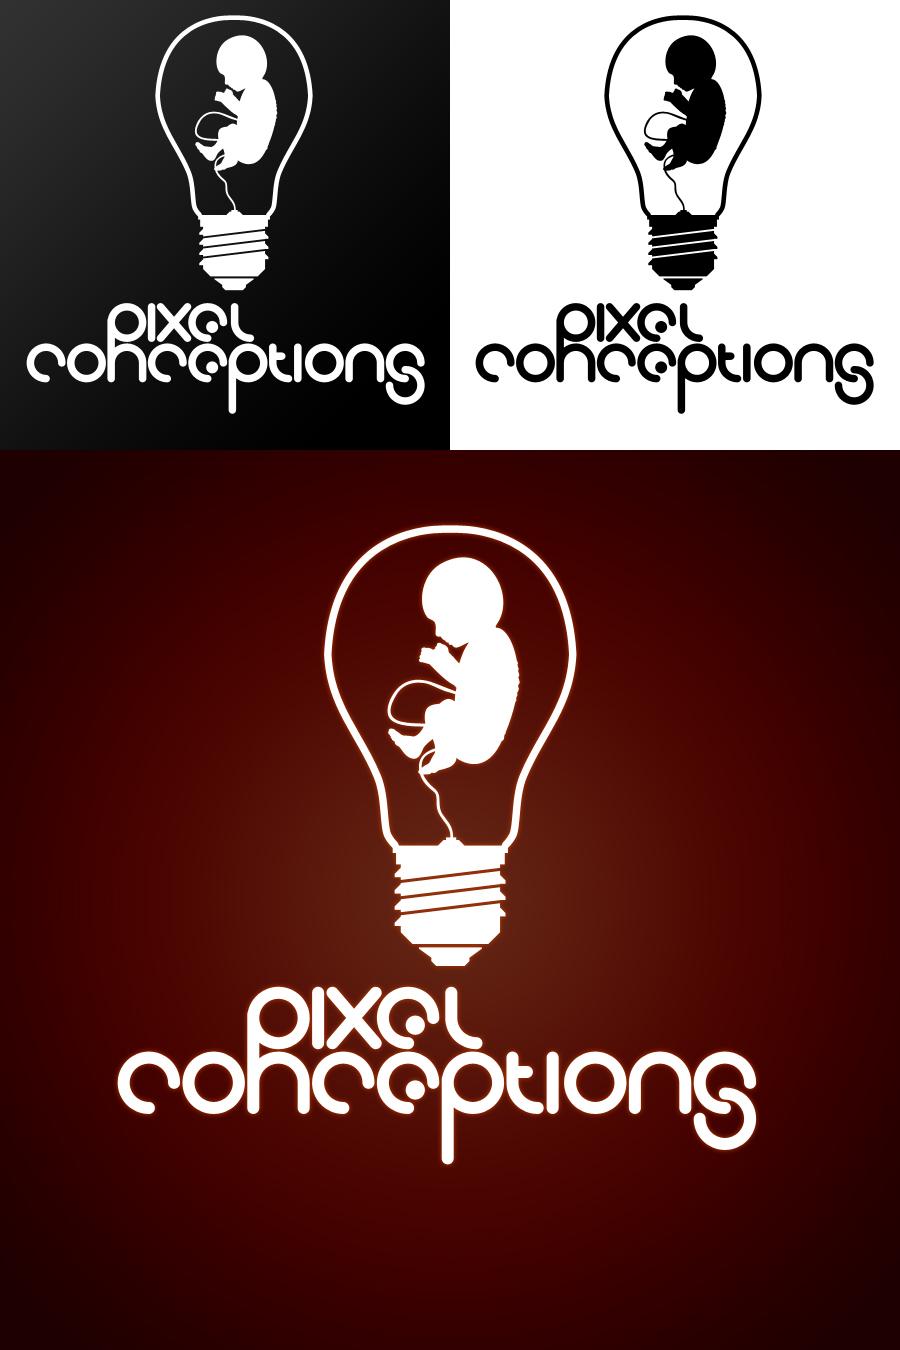 Pixel Conceptions